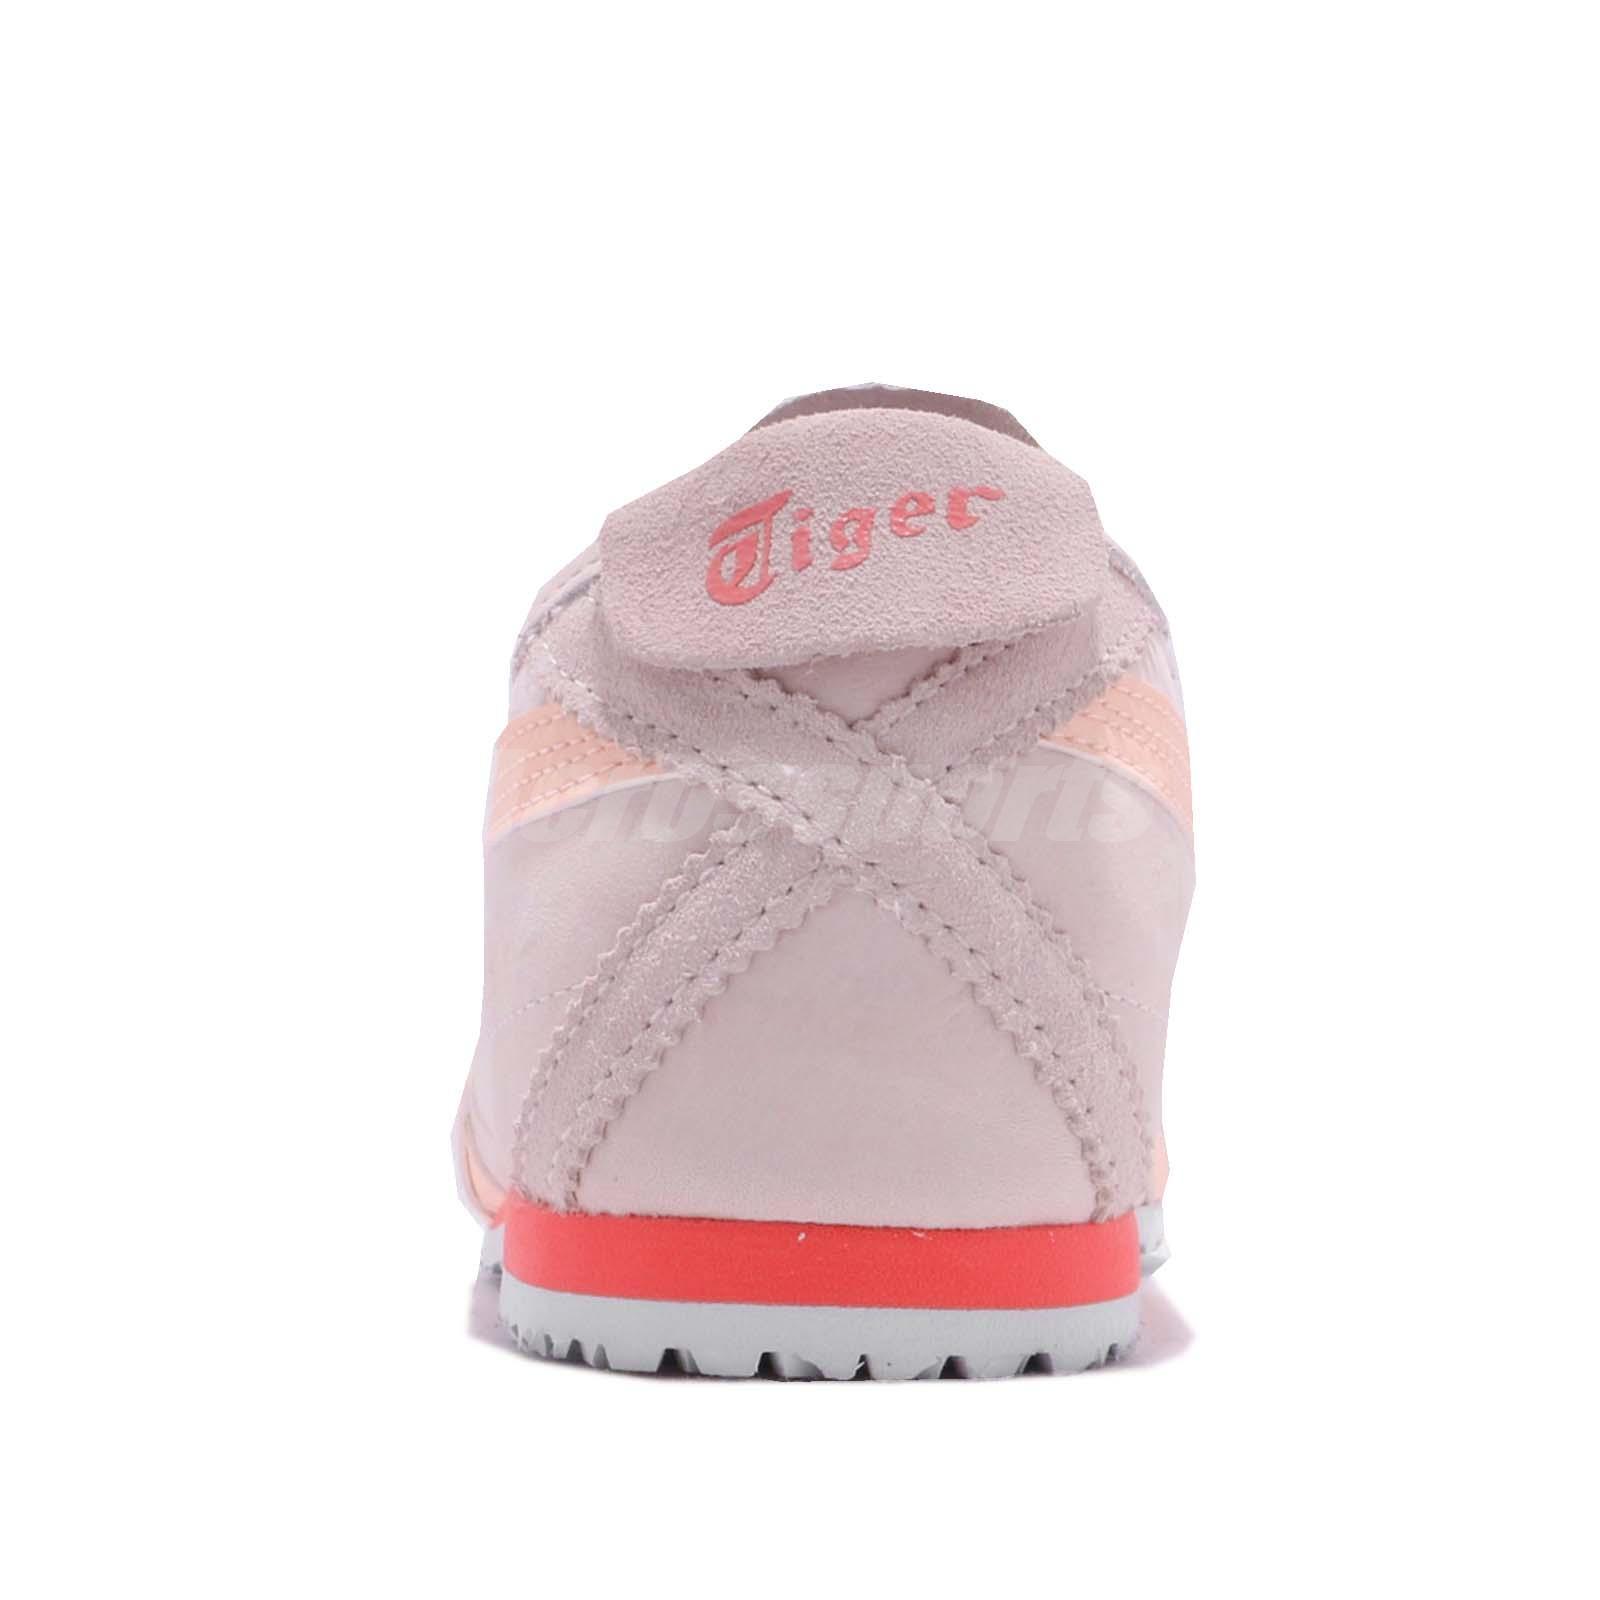 e361ca60d26 Asics Onitsuka Tiger Mexico 66 Blush Breeze Pink Men Women Shoes ...